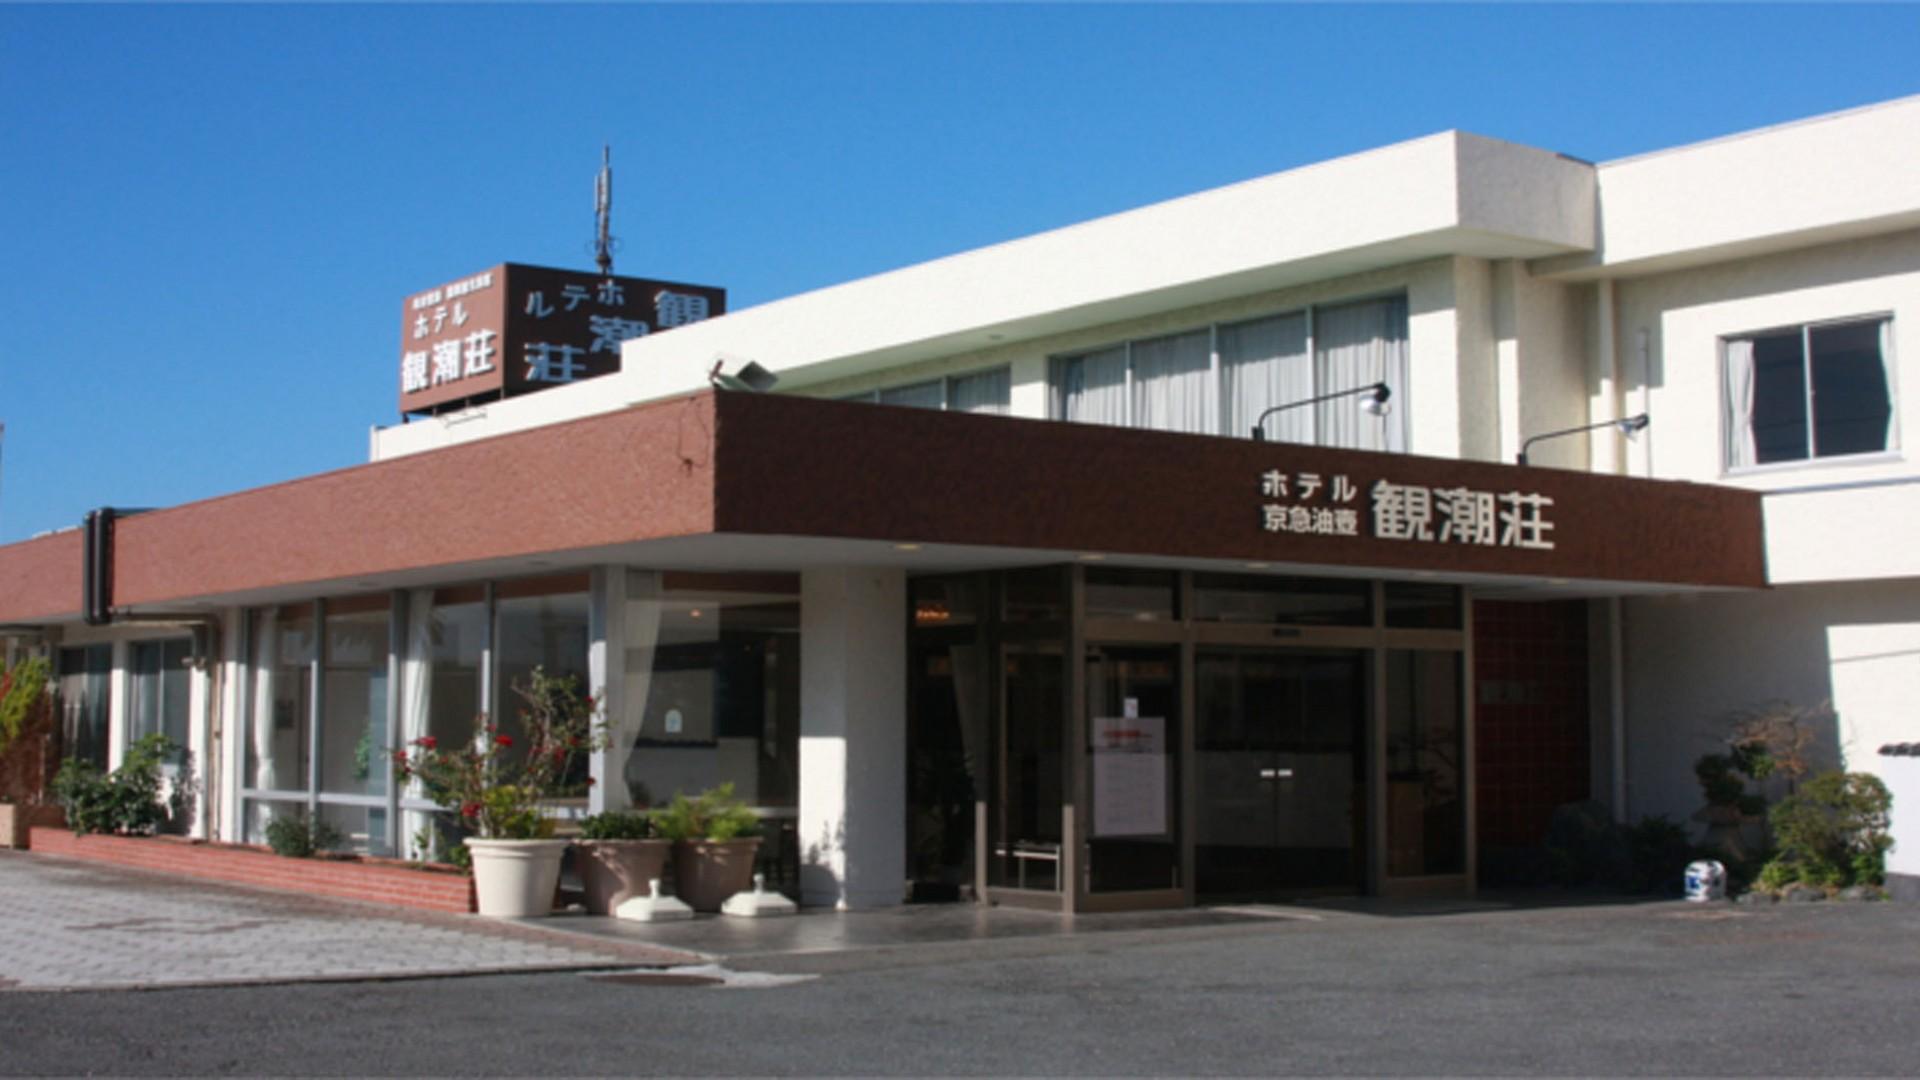 L'hotel Keikyu Aburatubo Kanchosou